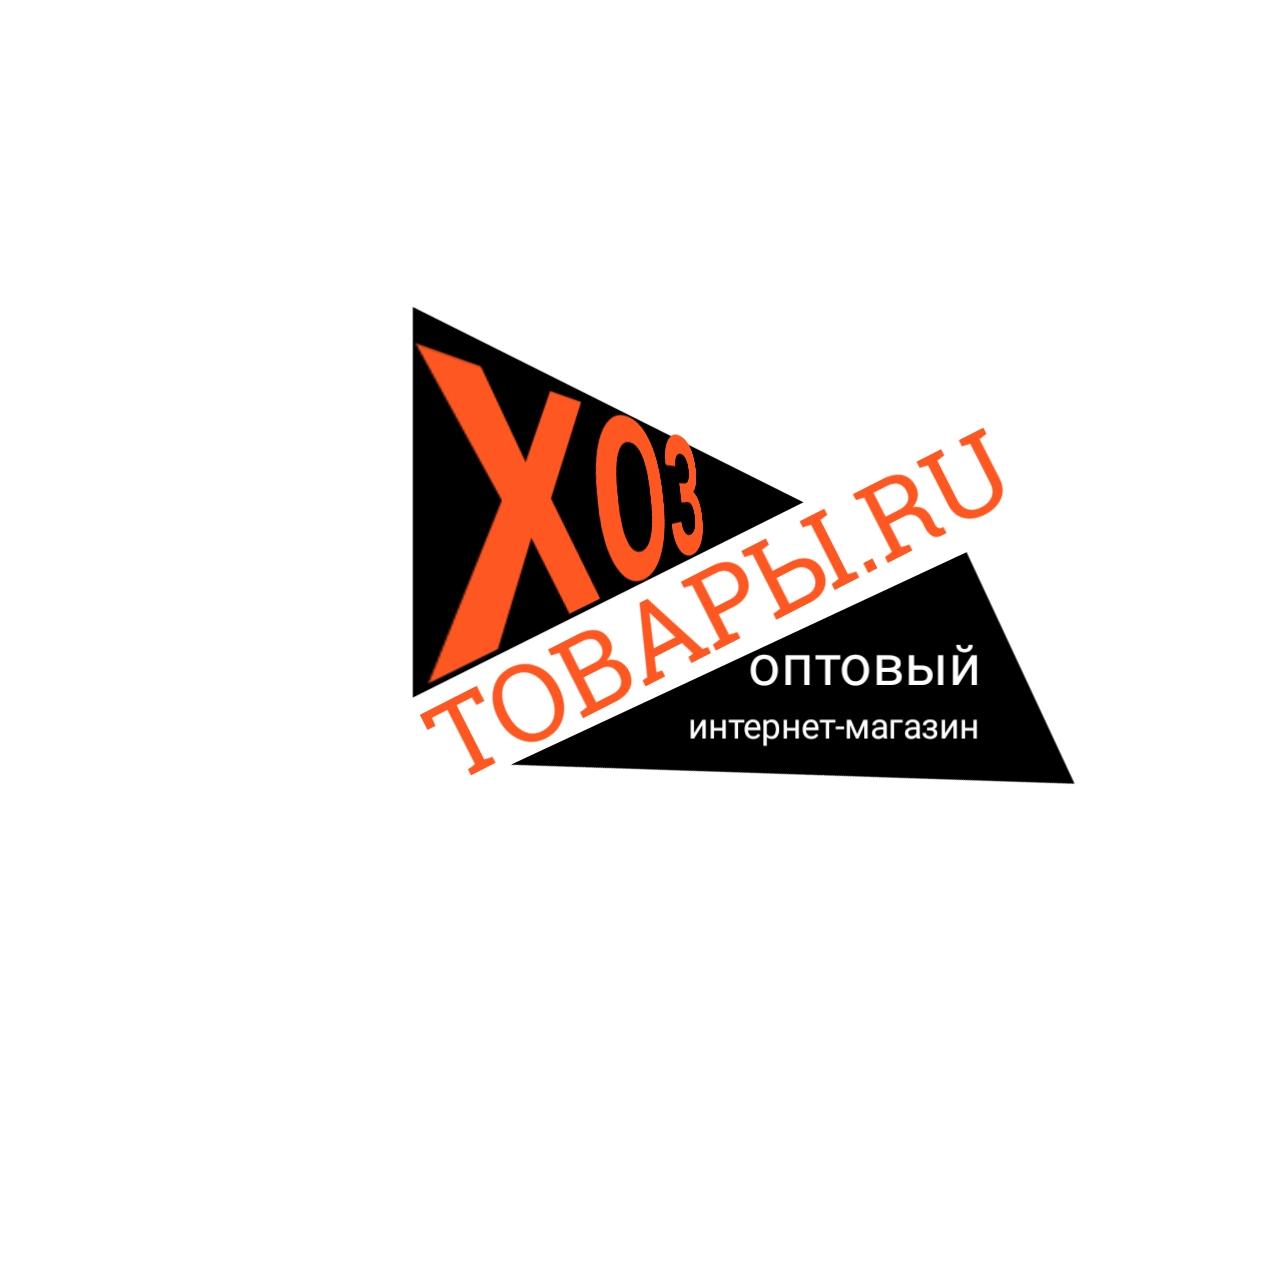 Разработка логотипа для оптового интернет-магазина «Хозтовары.ру» фото f_513606f5d62cda85.jpg